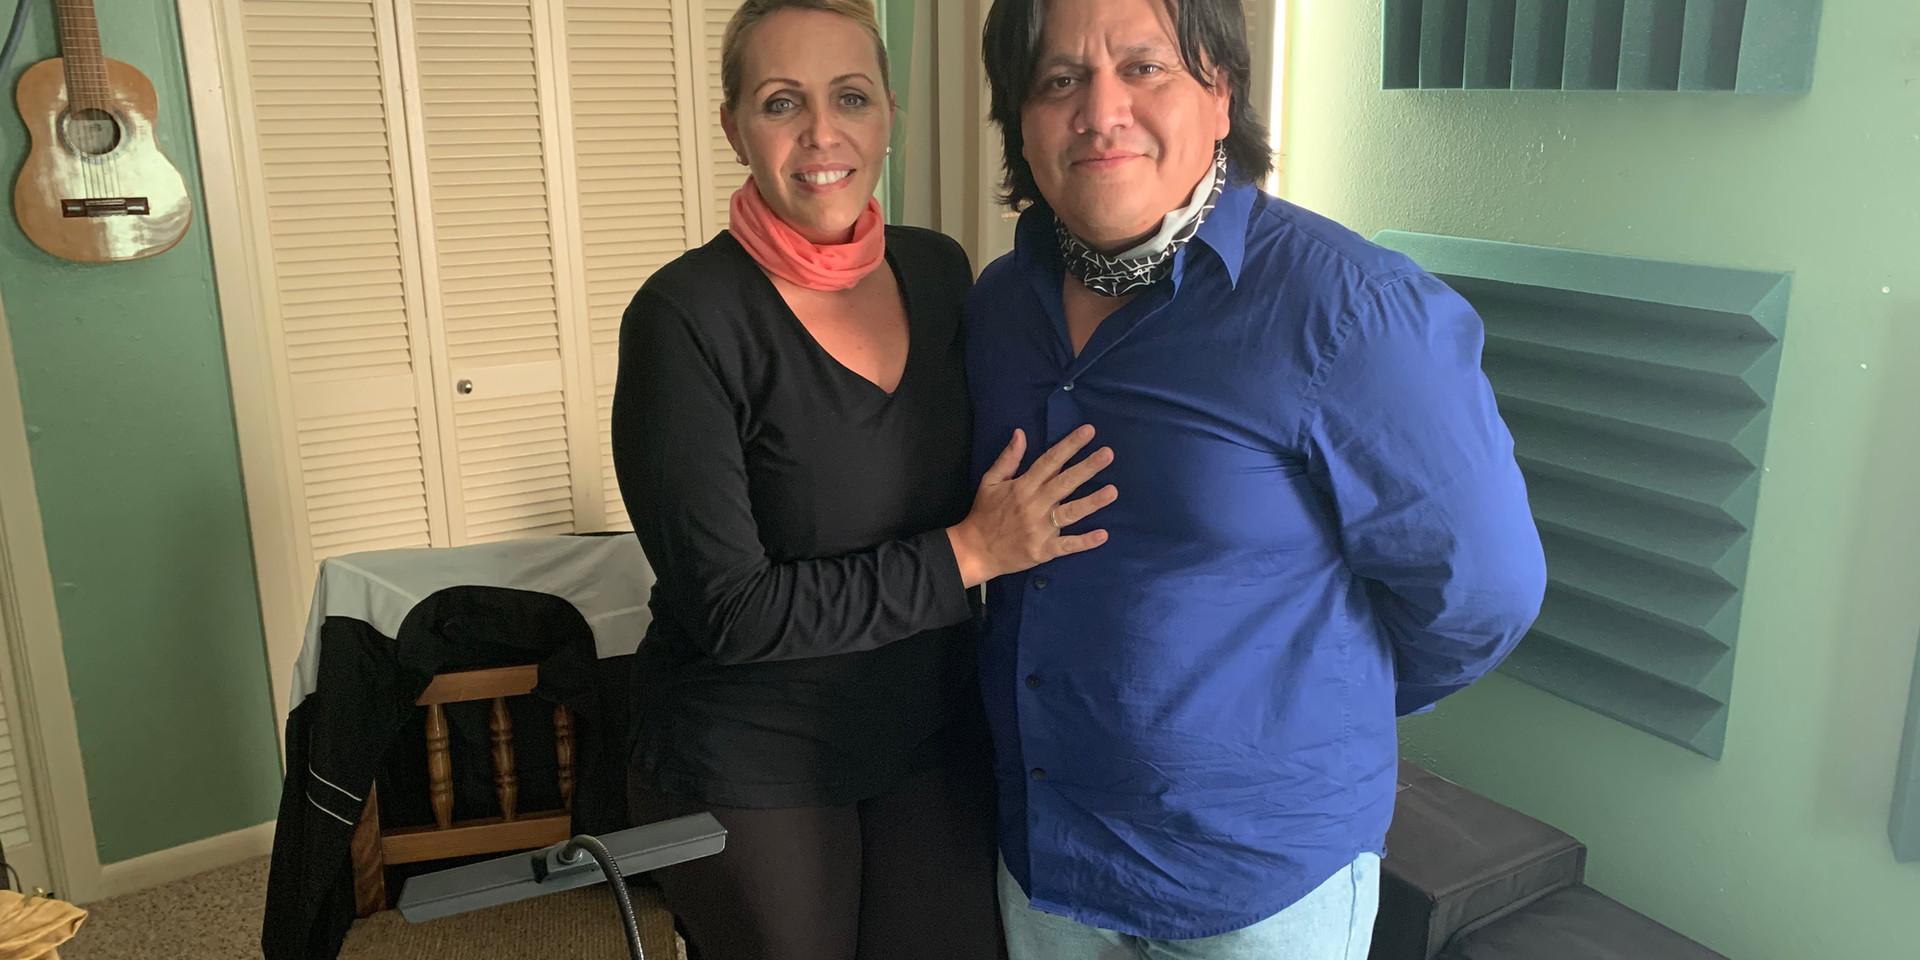 Zendra and Jose'